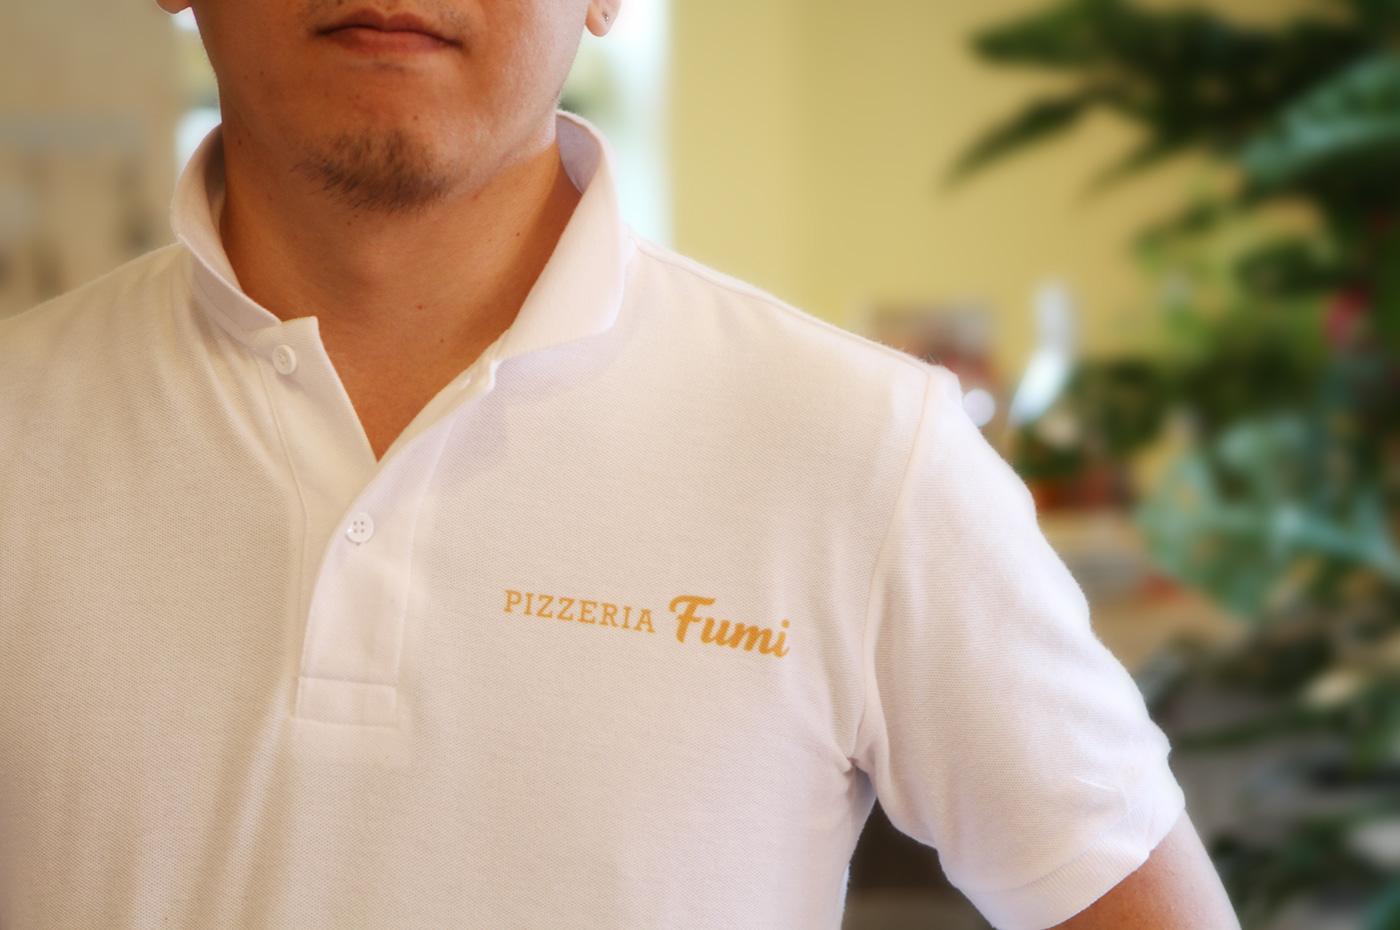 PIZZERIA fumi[飲食店]ポロシャツデザイン